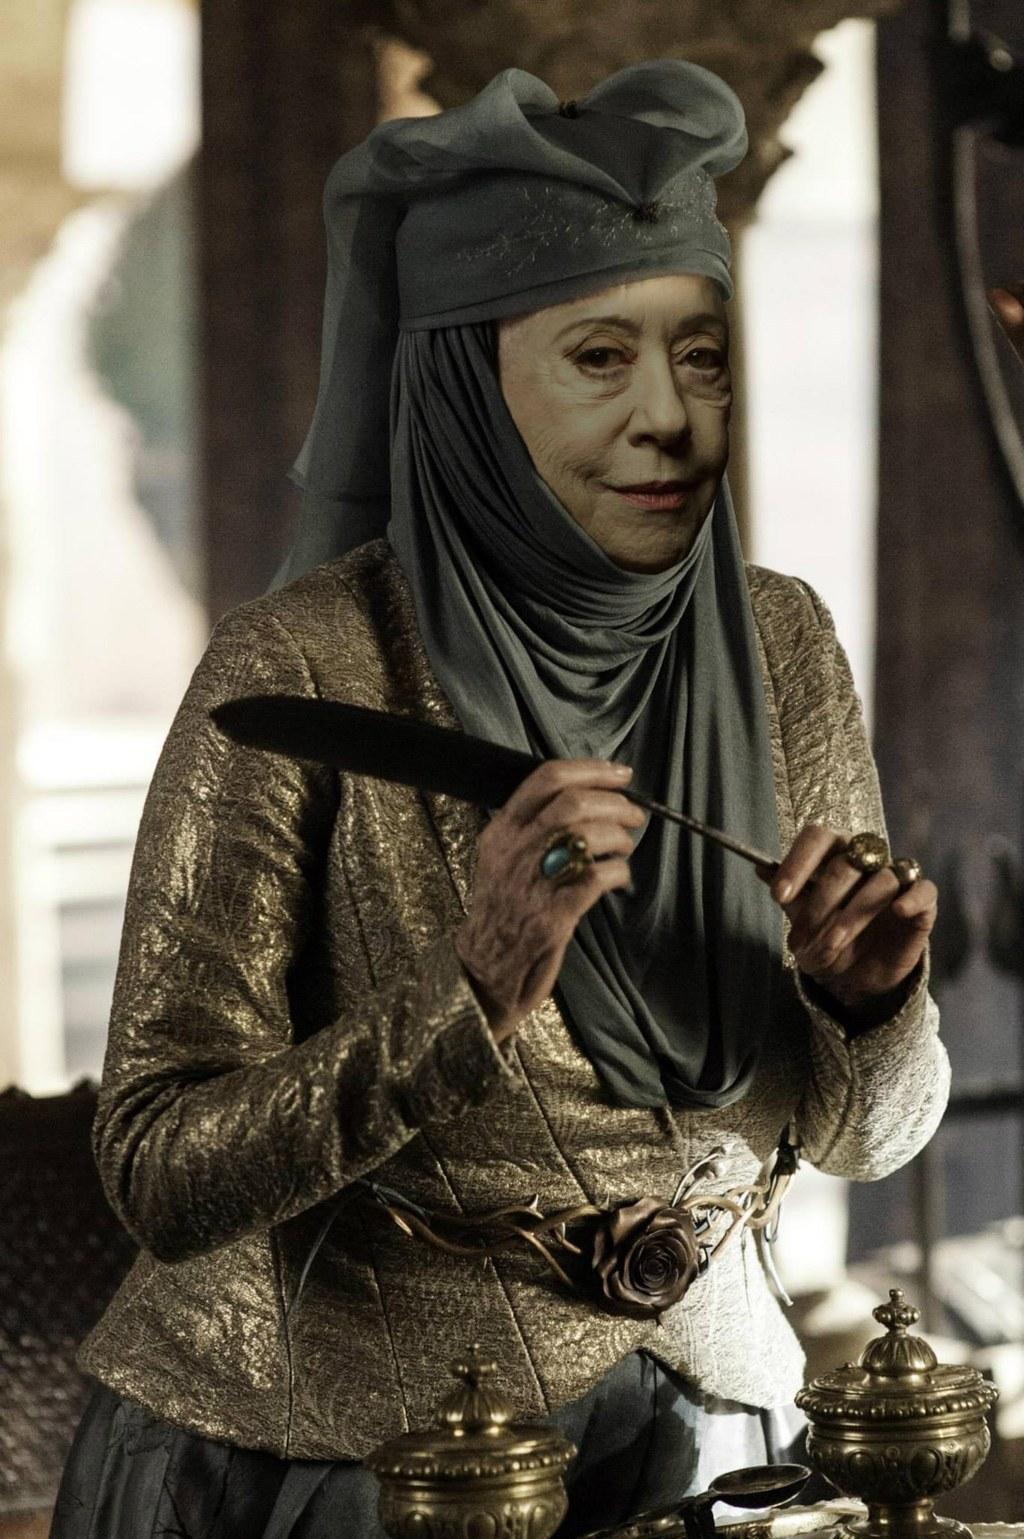 E se Game of Thrones fosse estrelado por atores brasileiros?